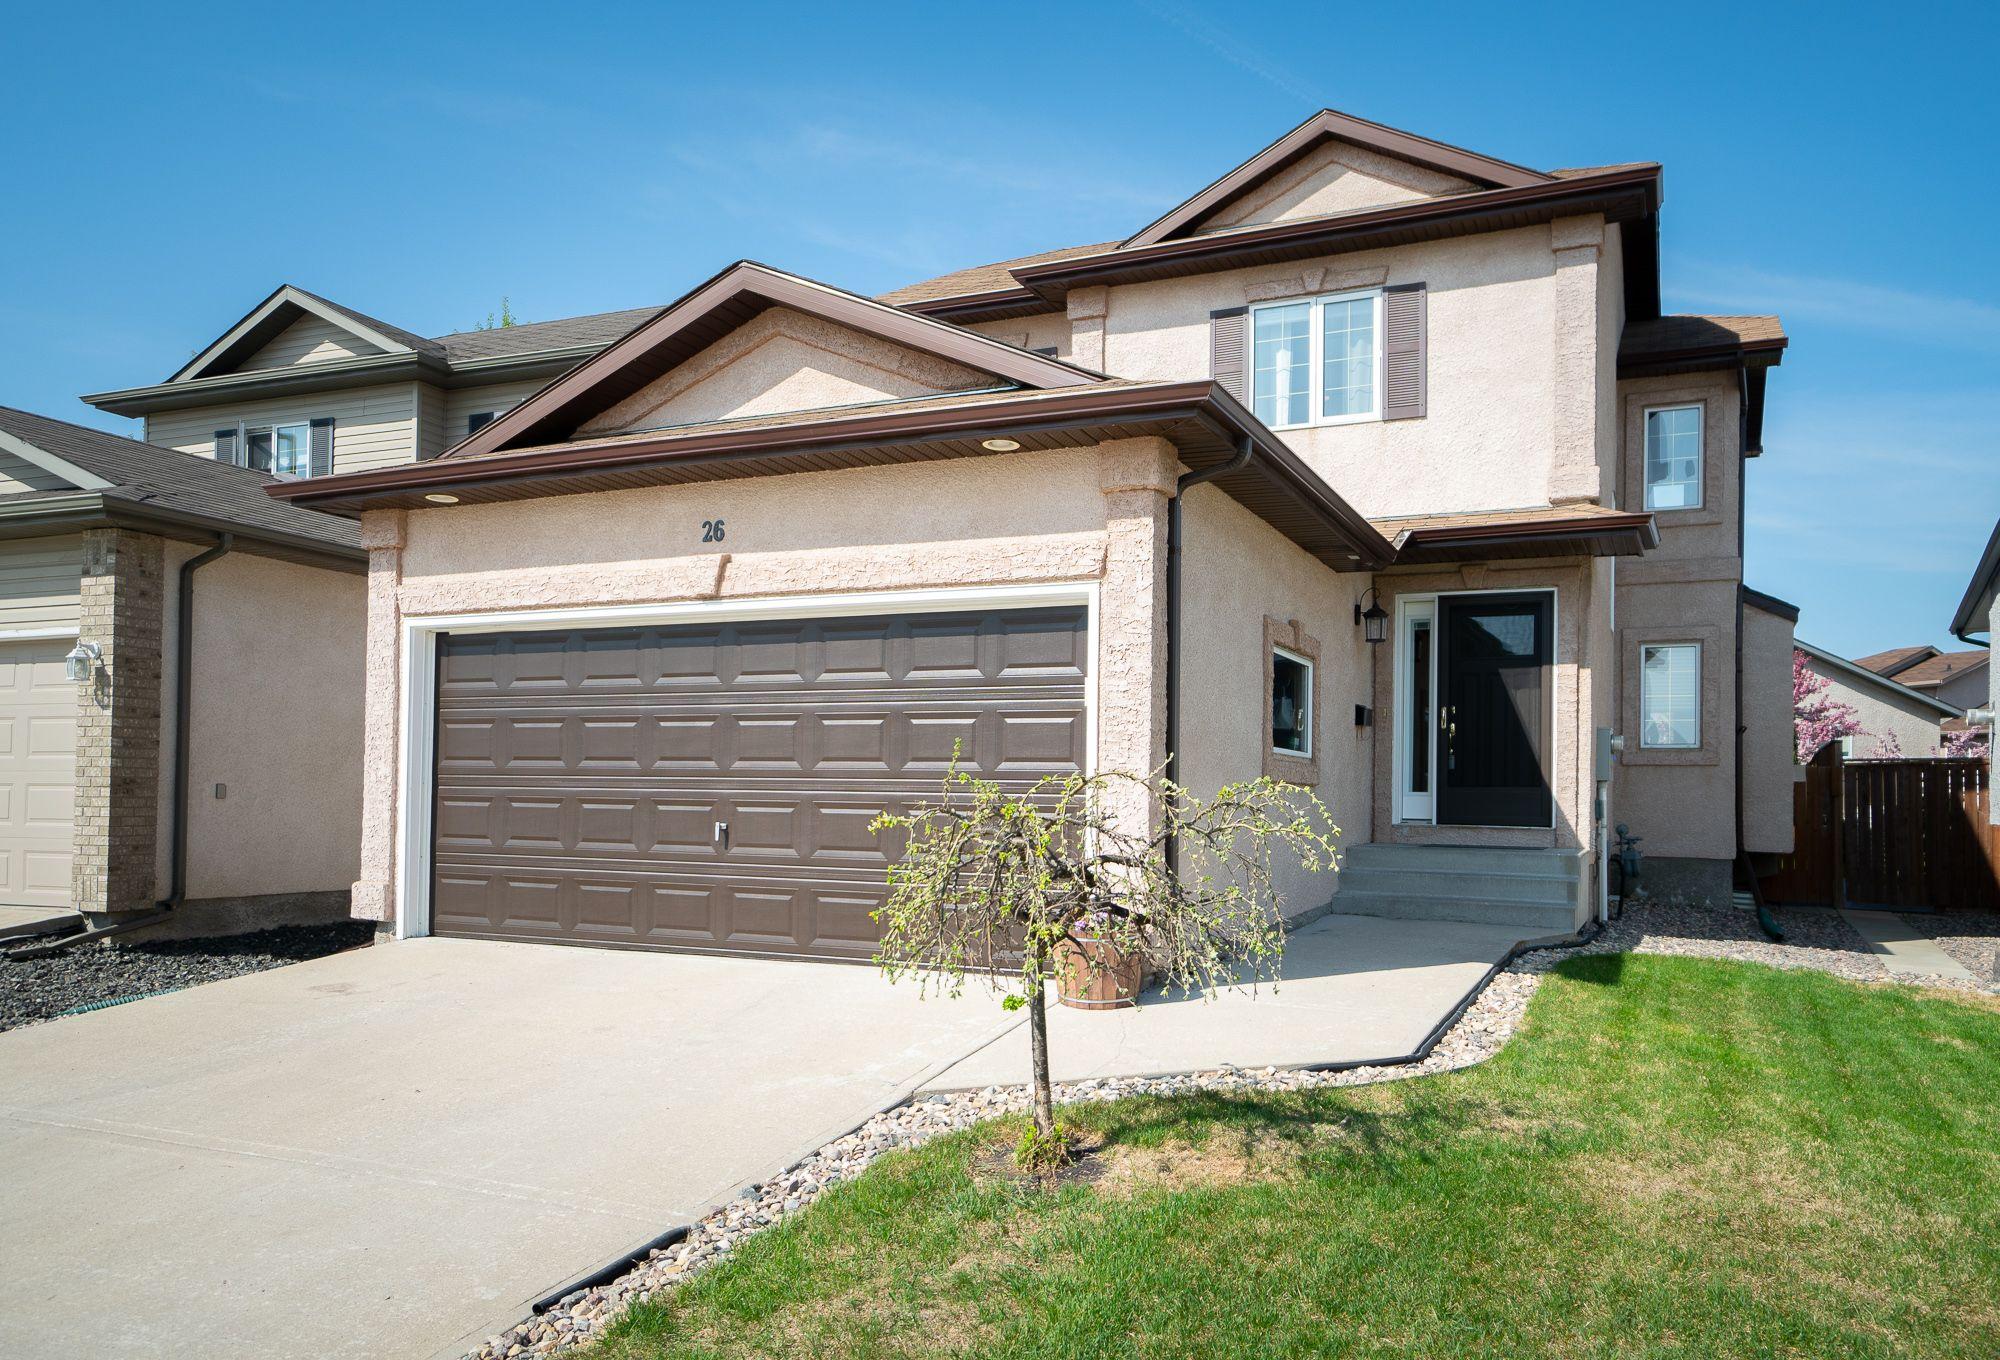 Main Photo: 26 Edmund Gale Drive in Winnipeg: Canterbury Park House for sale (3M)  : MLS®# 1813373